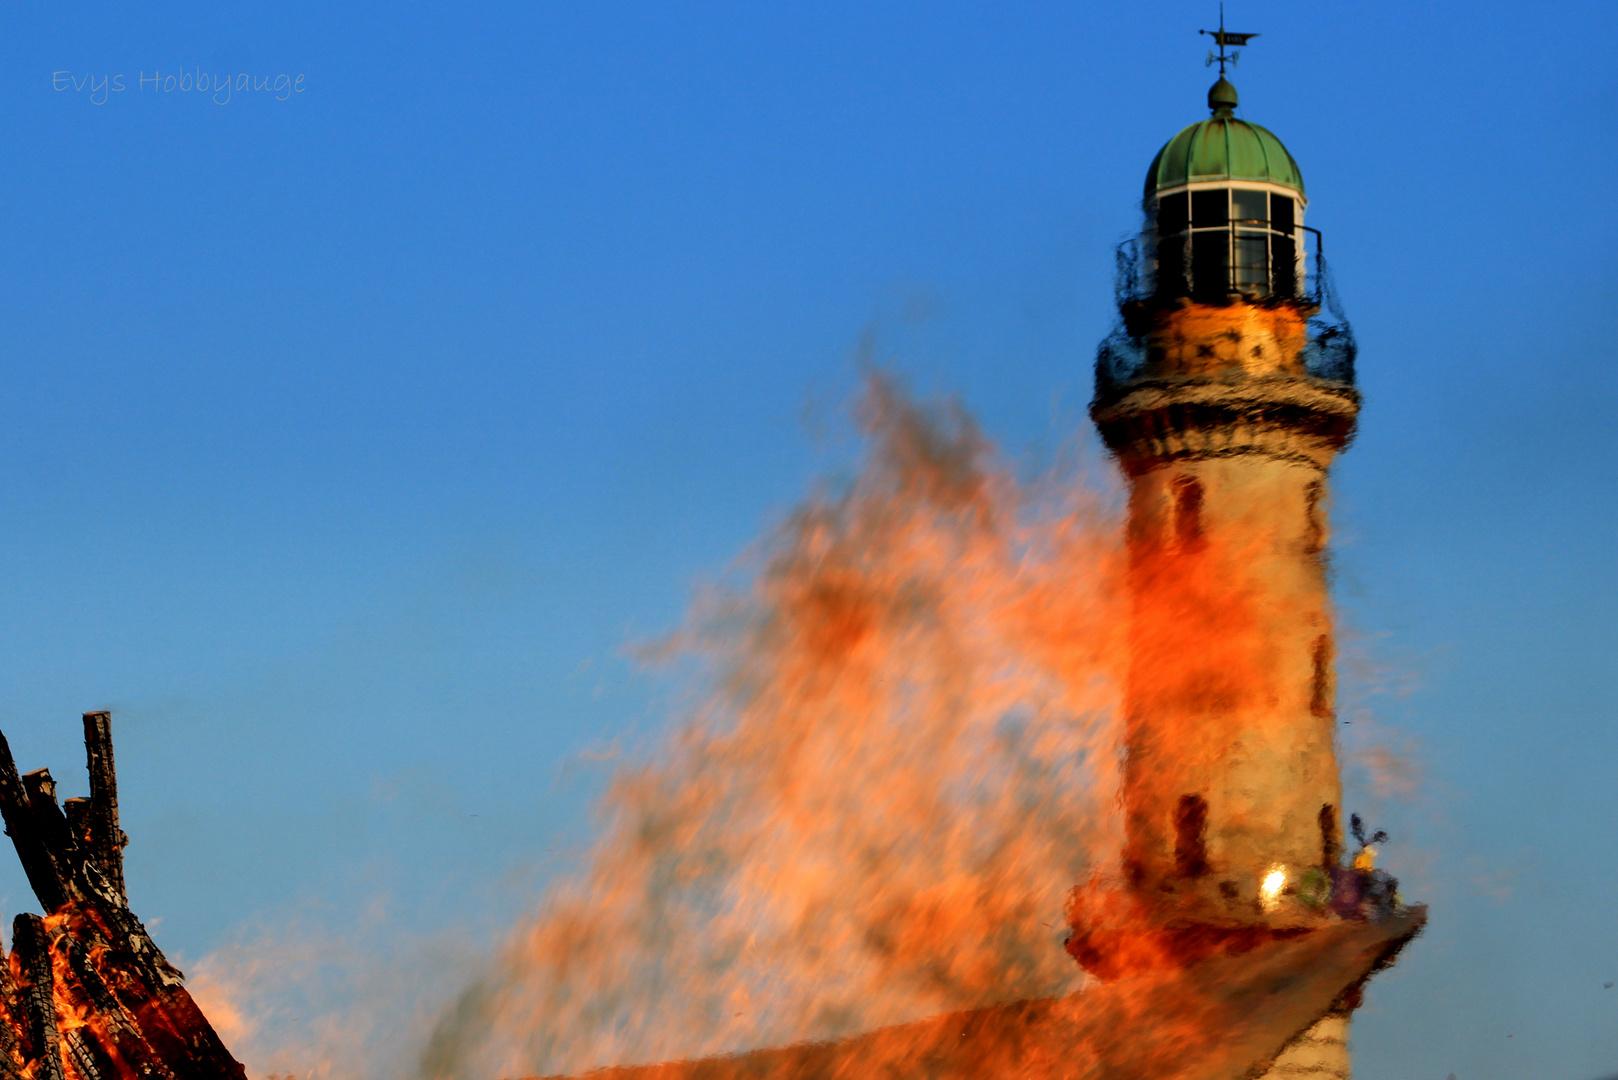 Leuchtturm in Flammen - mal anders